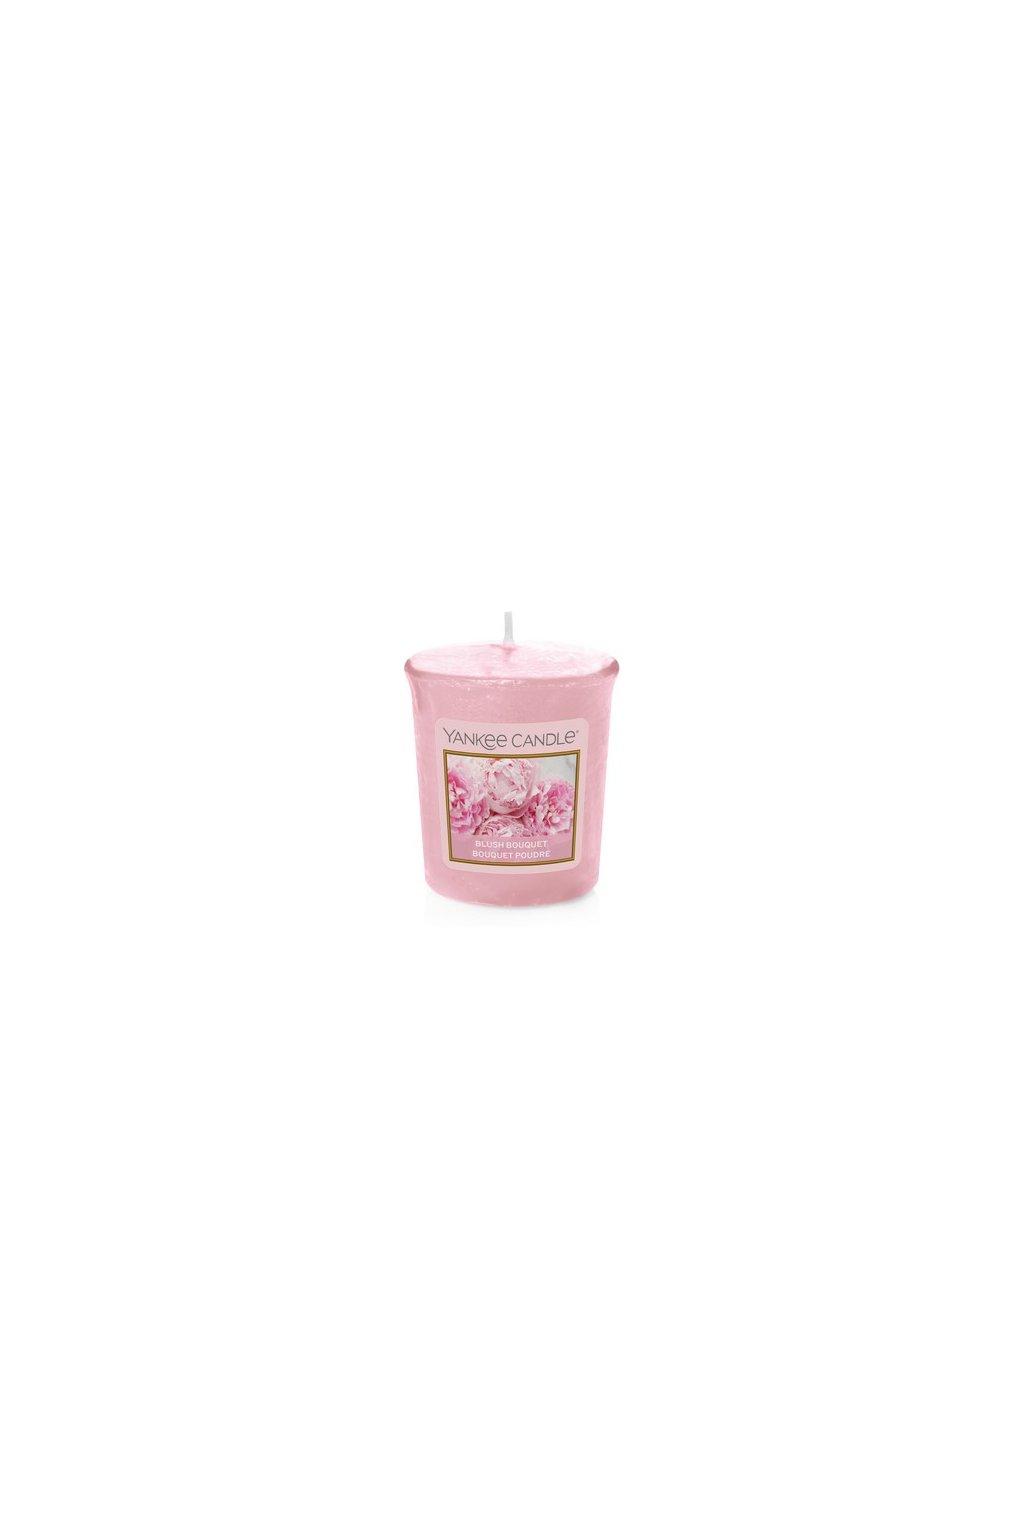 Yankee Candle Blush Bouquet 49g